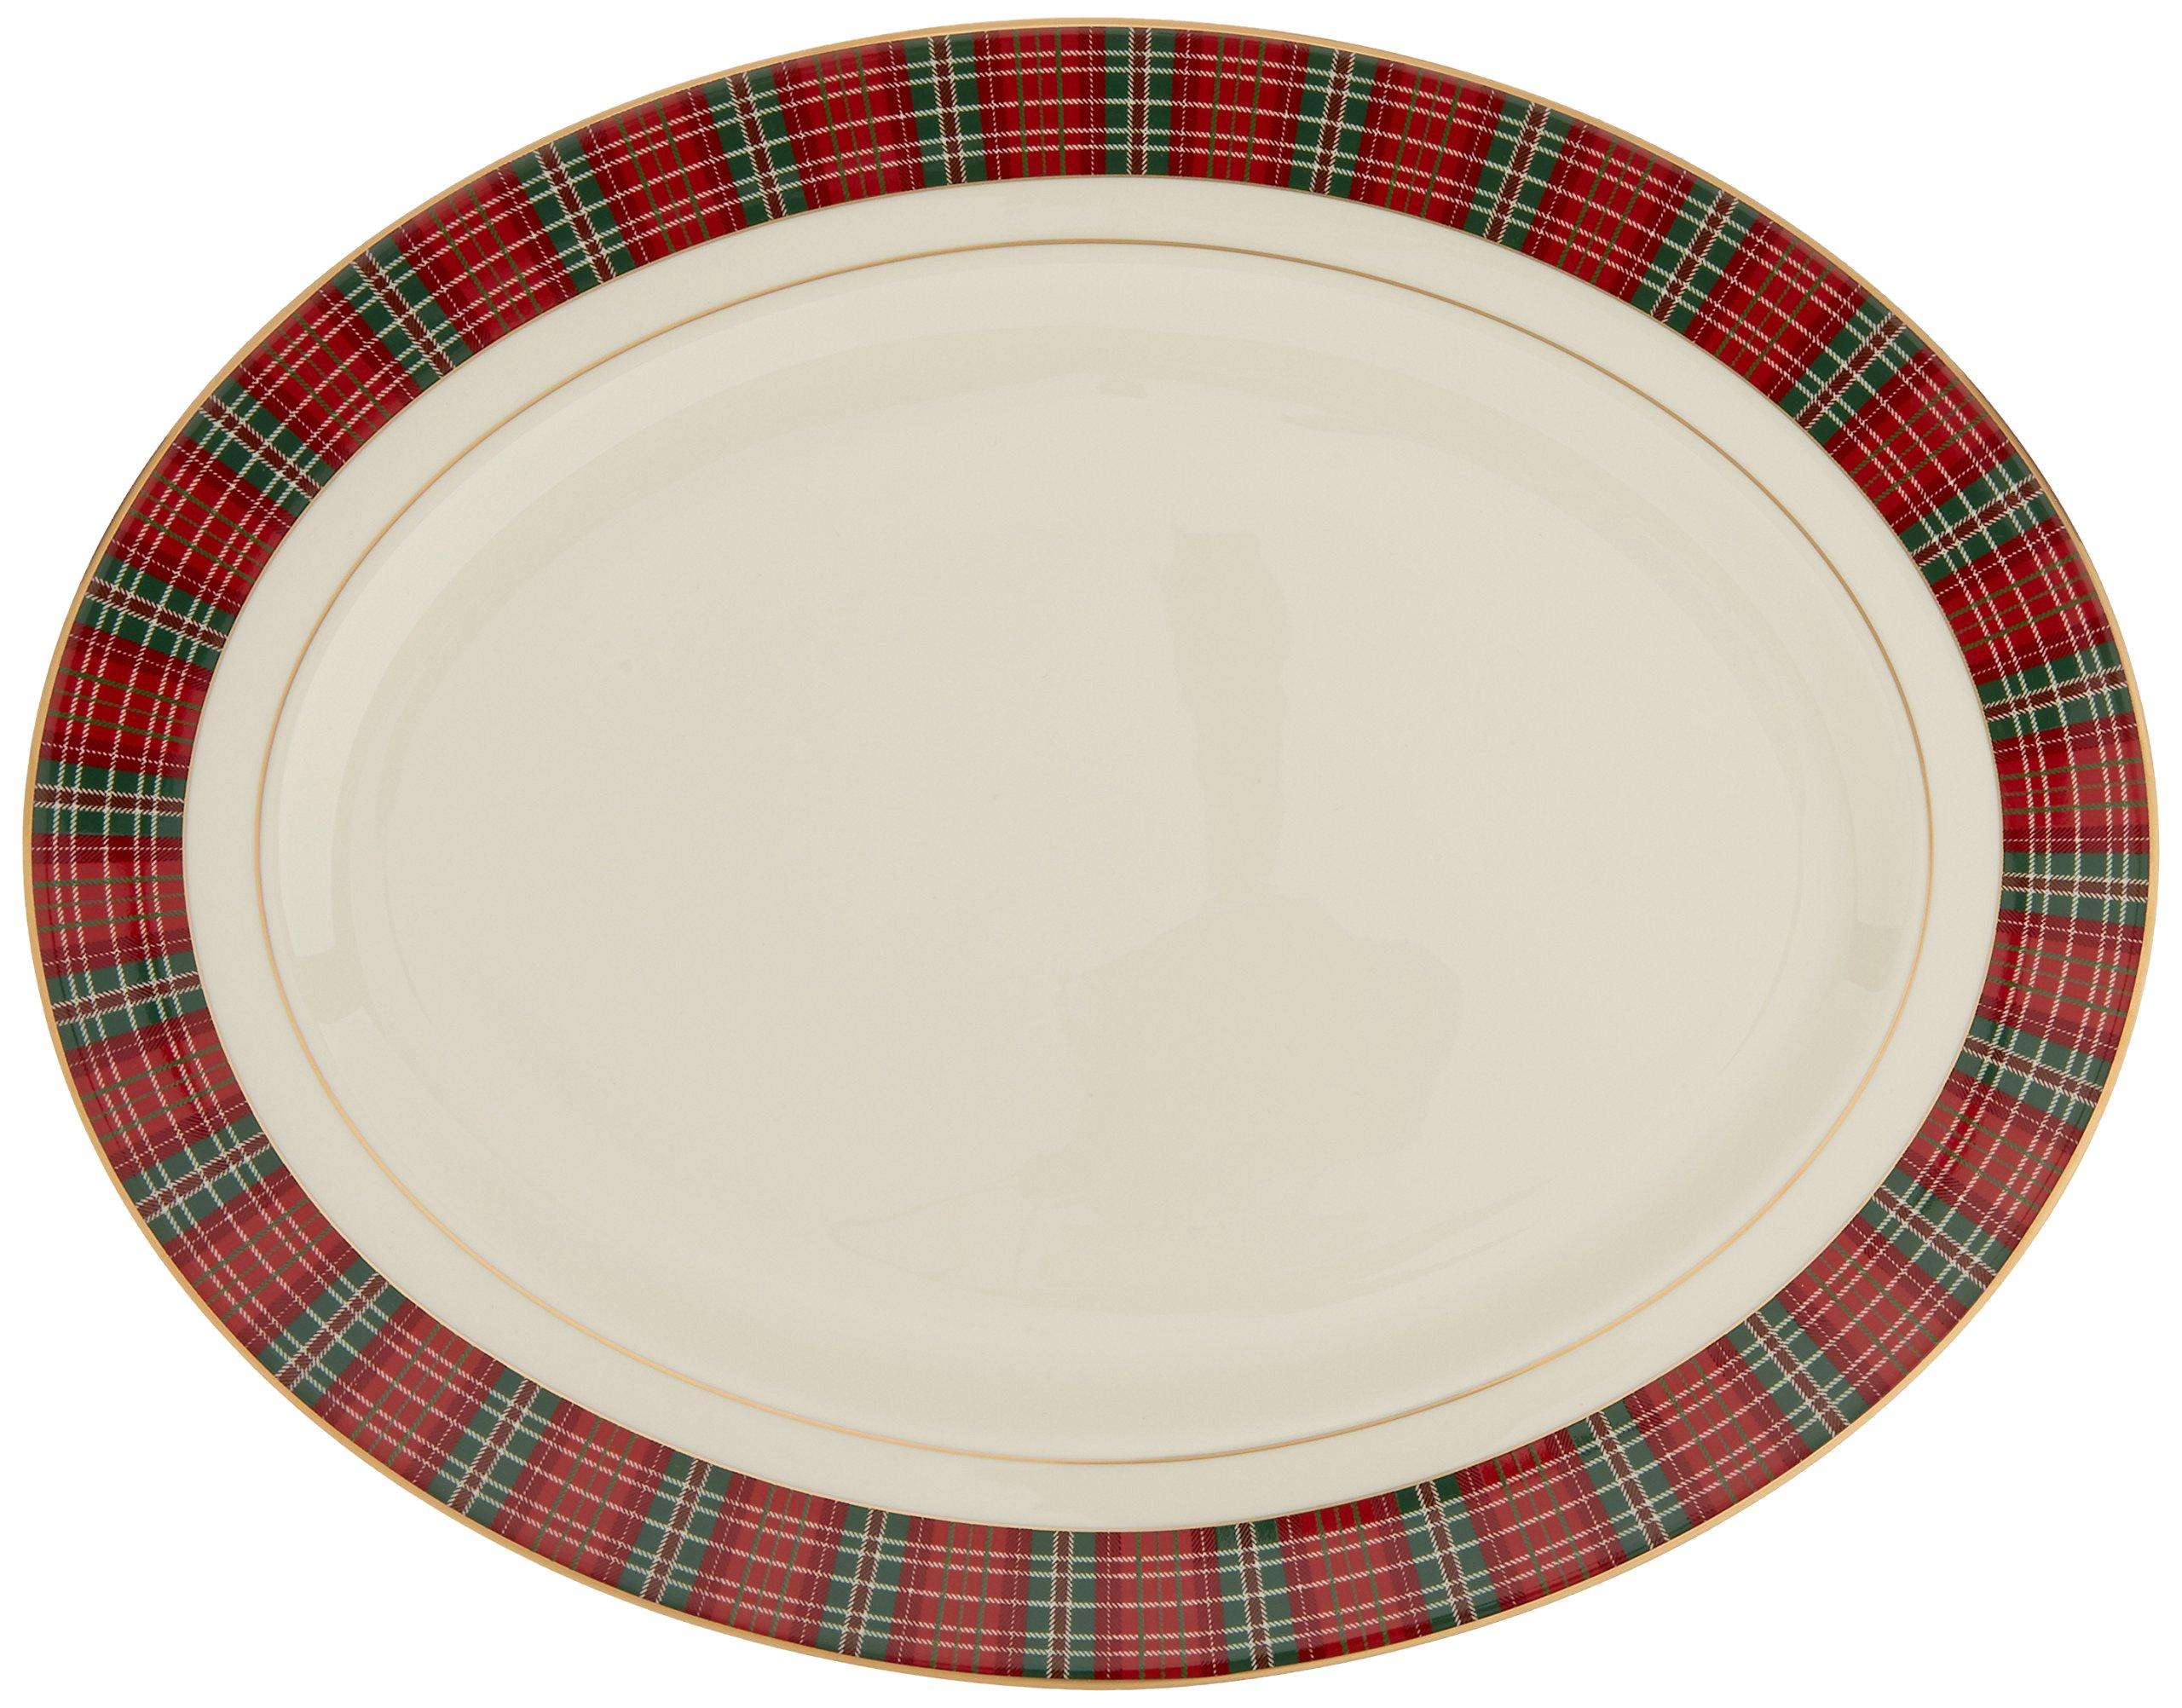 Lenox Winter Greetings Plaid Oval Platter